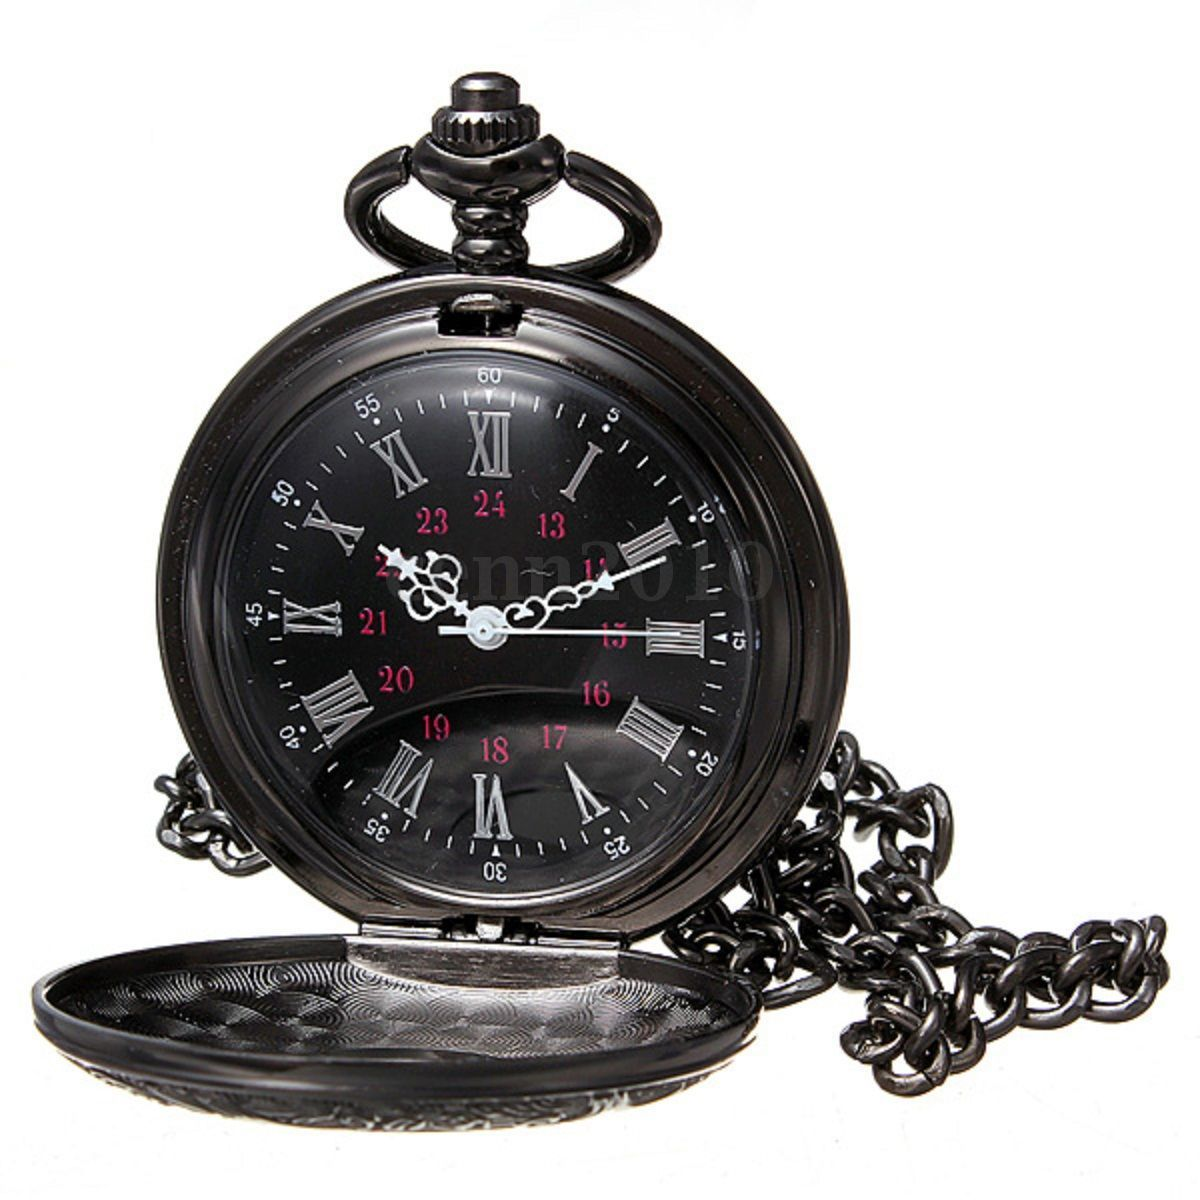 YCYS-Vintage Steampunk Black Roman Numerals Necklace Quartz Pendant Pocket Watch Gift blackhawk field operator watch with black numerals